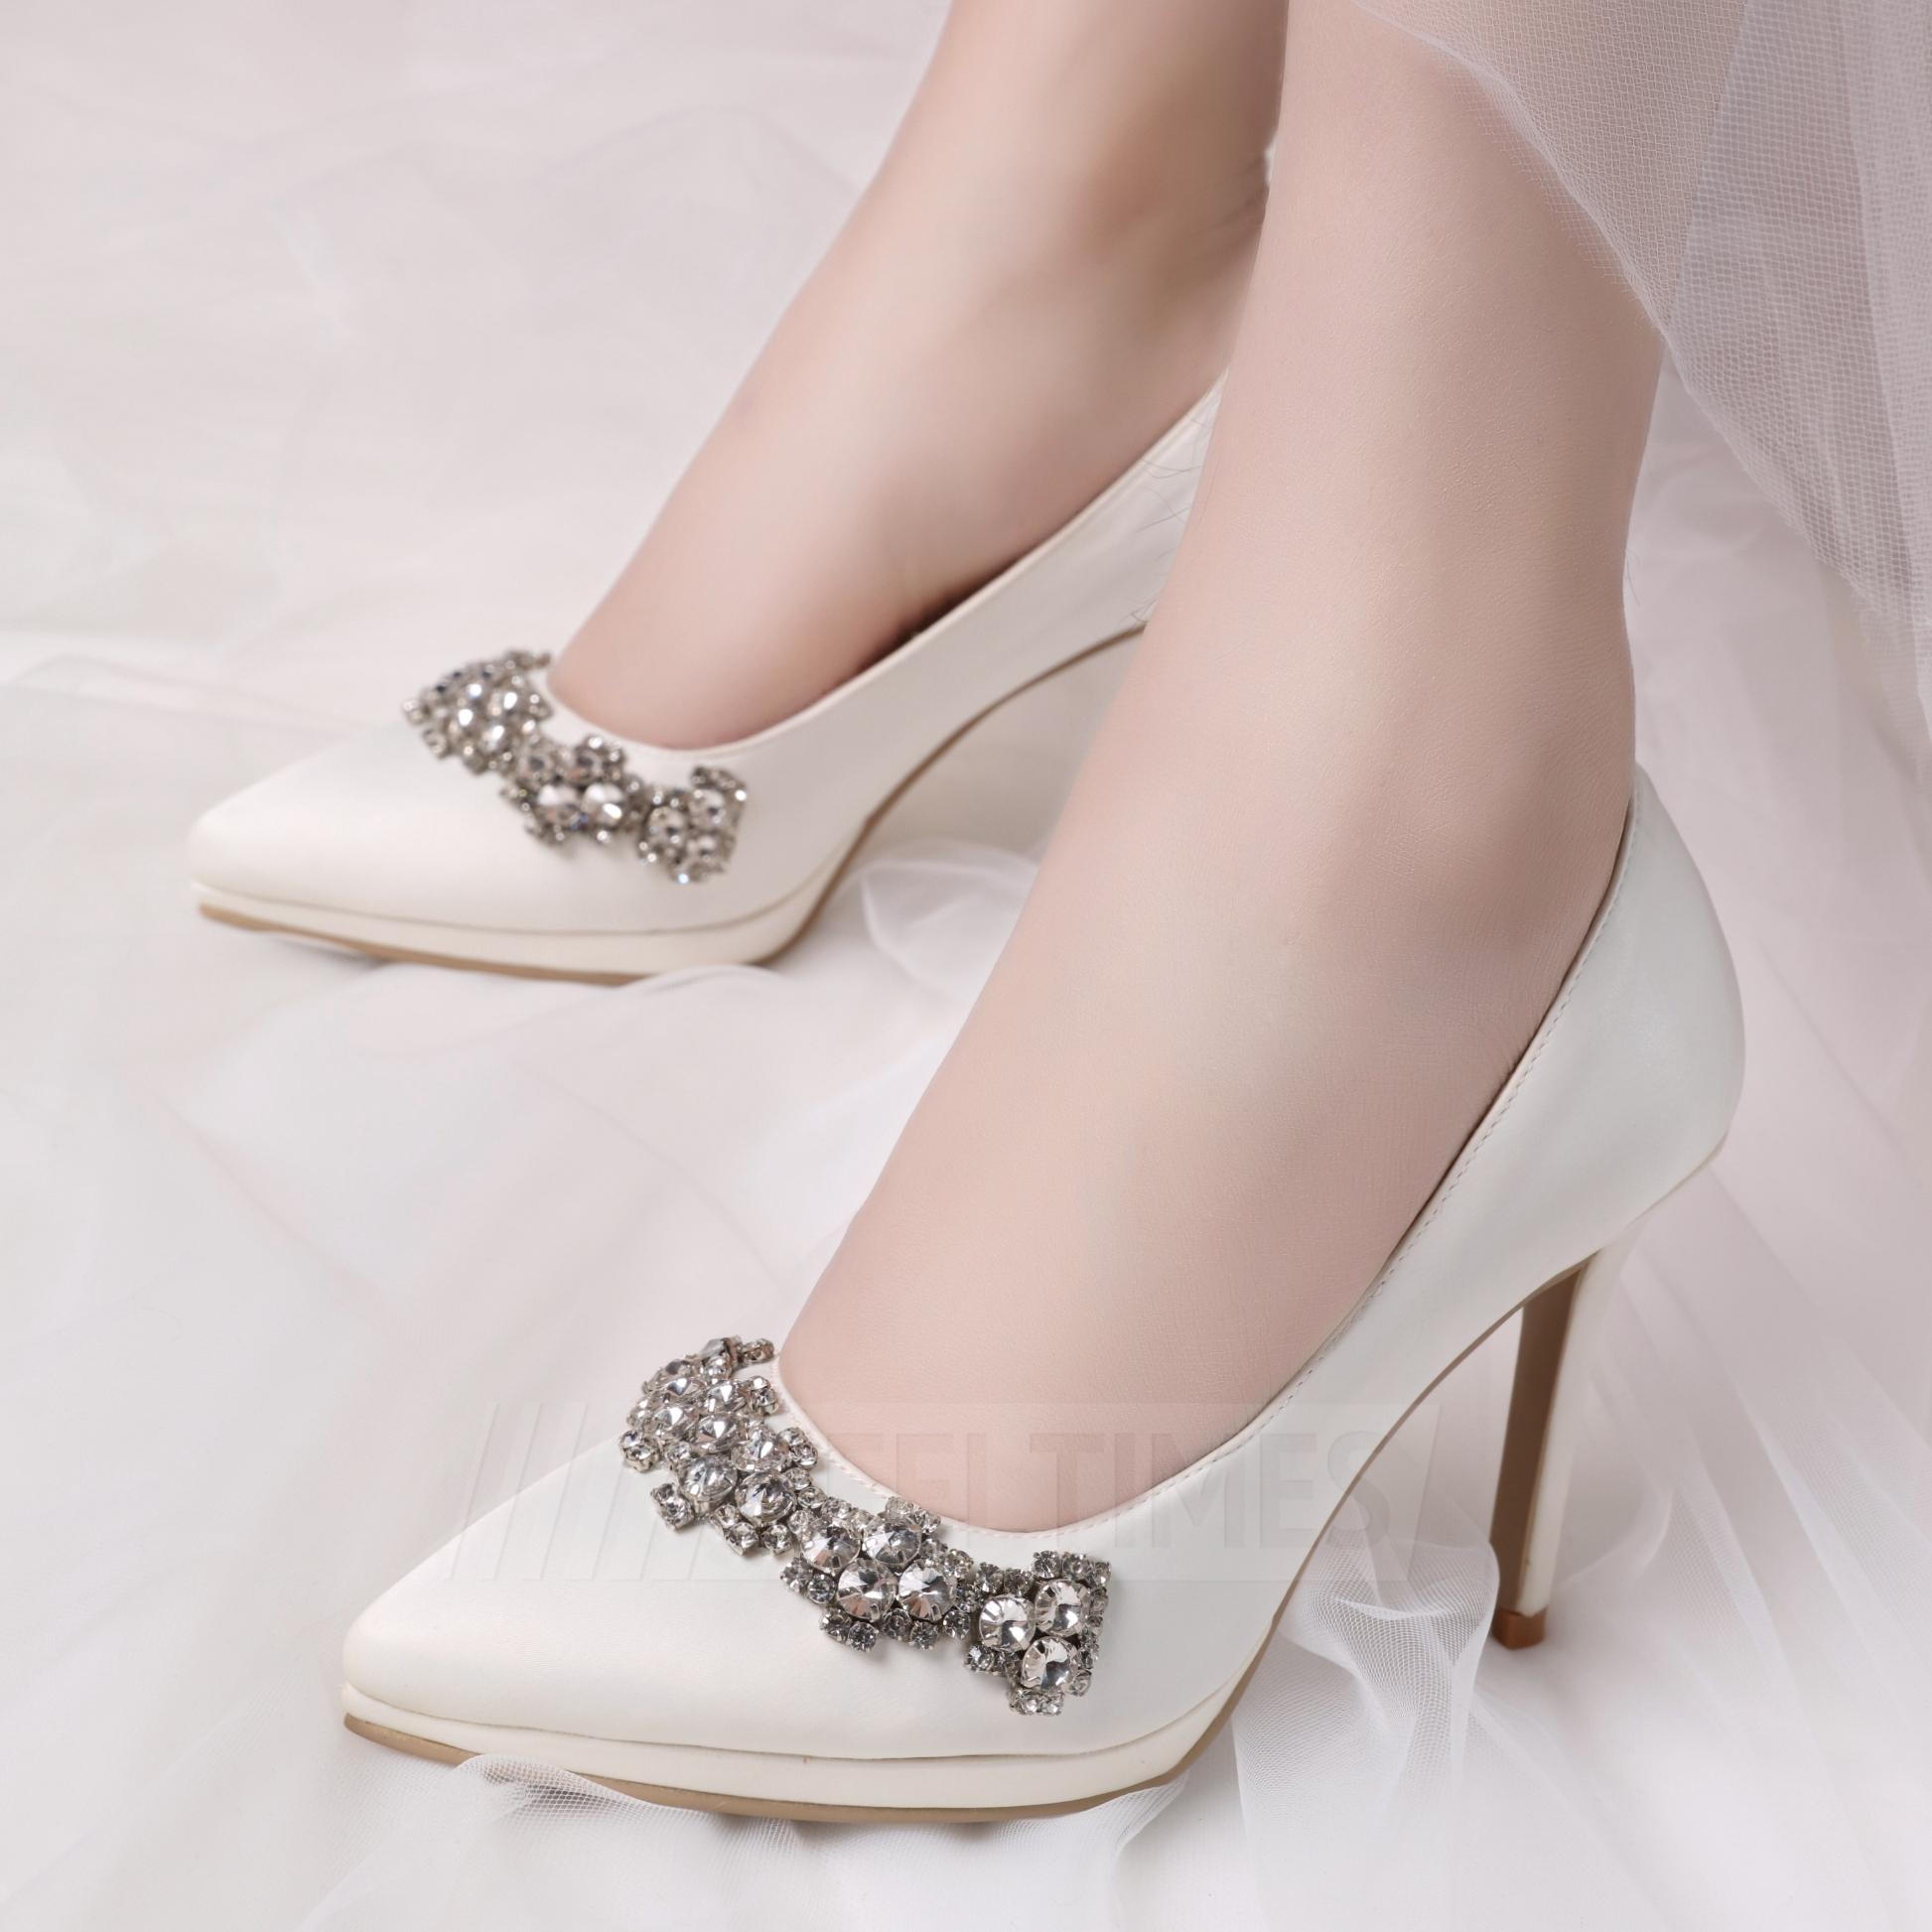 Women's Satin With Rhinestone Close Toe Heels Wedding Shoes